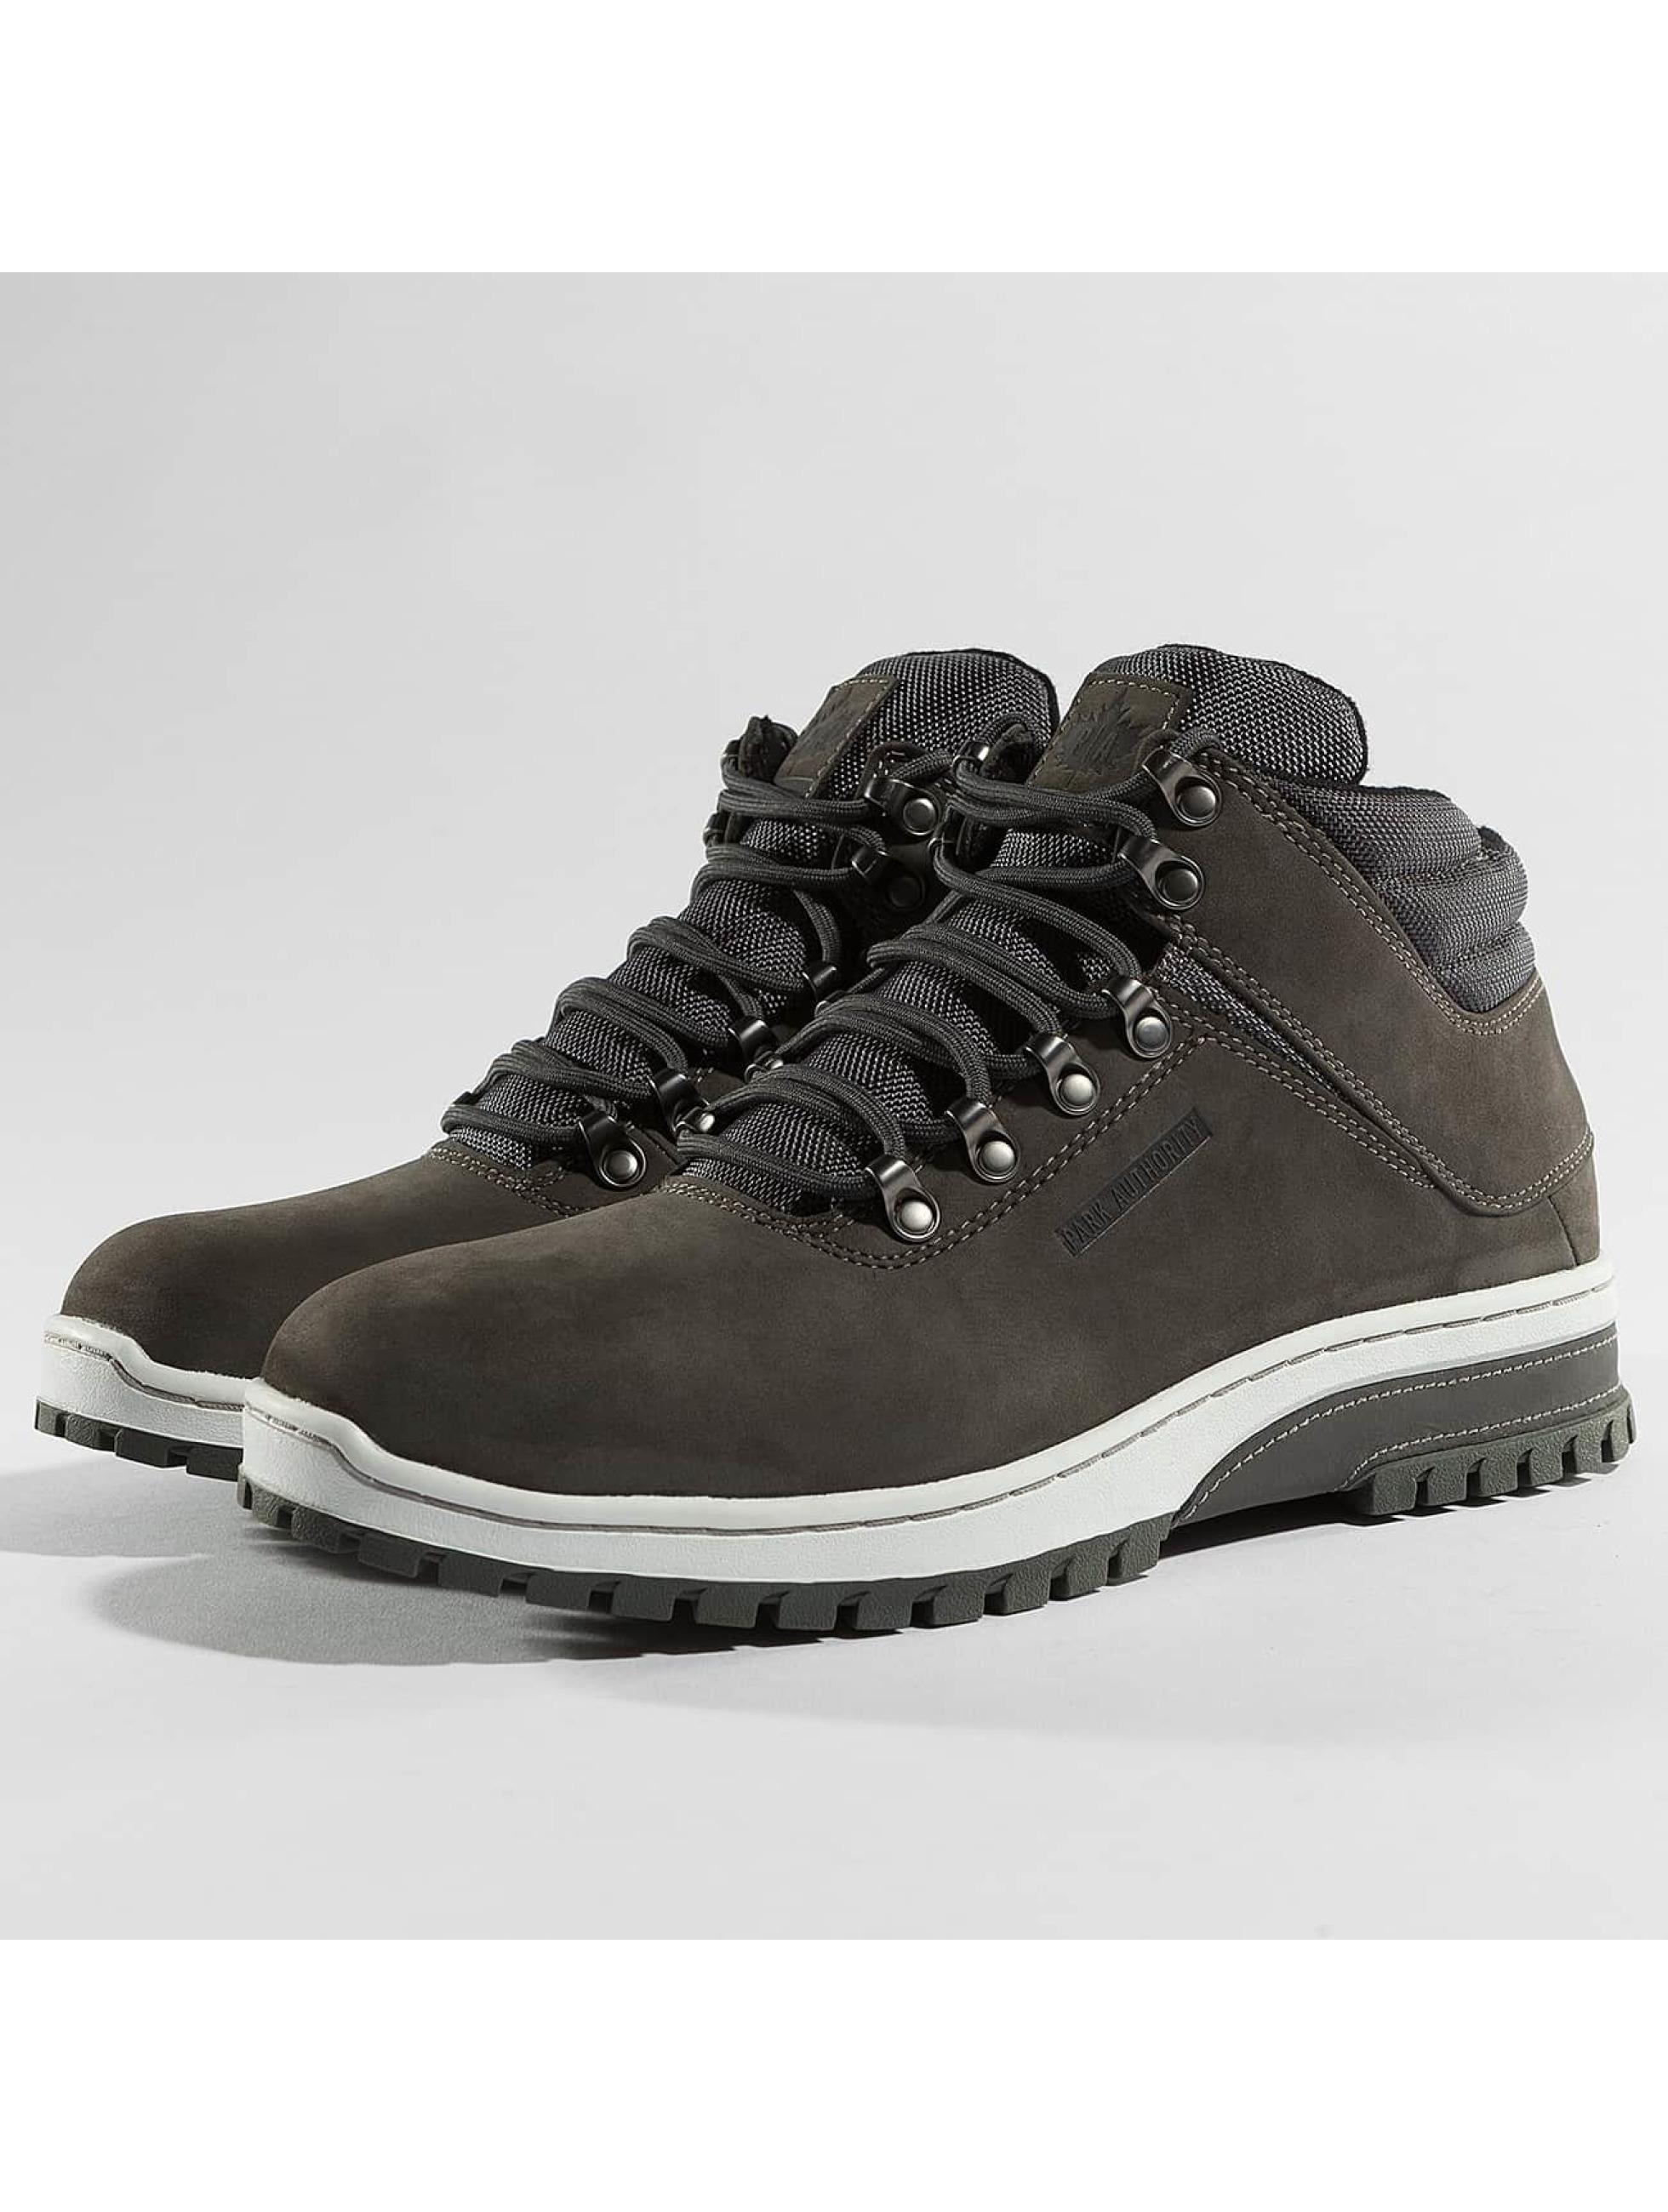 K1X Männer Boots H1ke Territory in grau